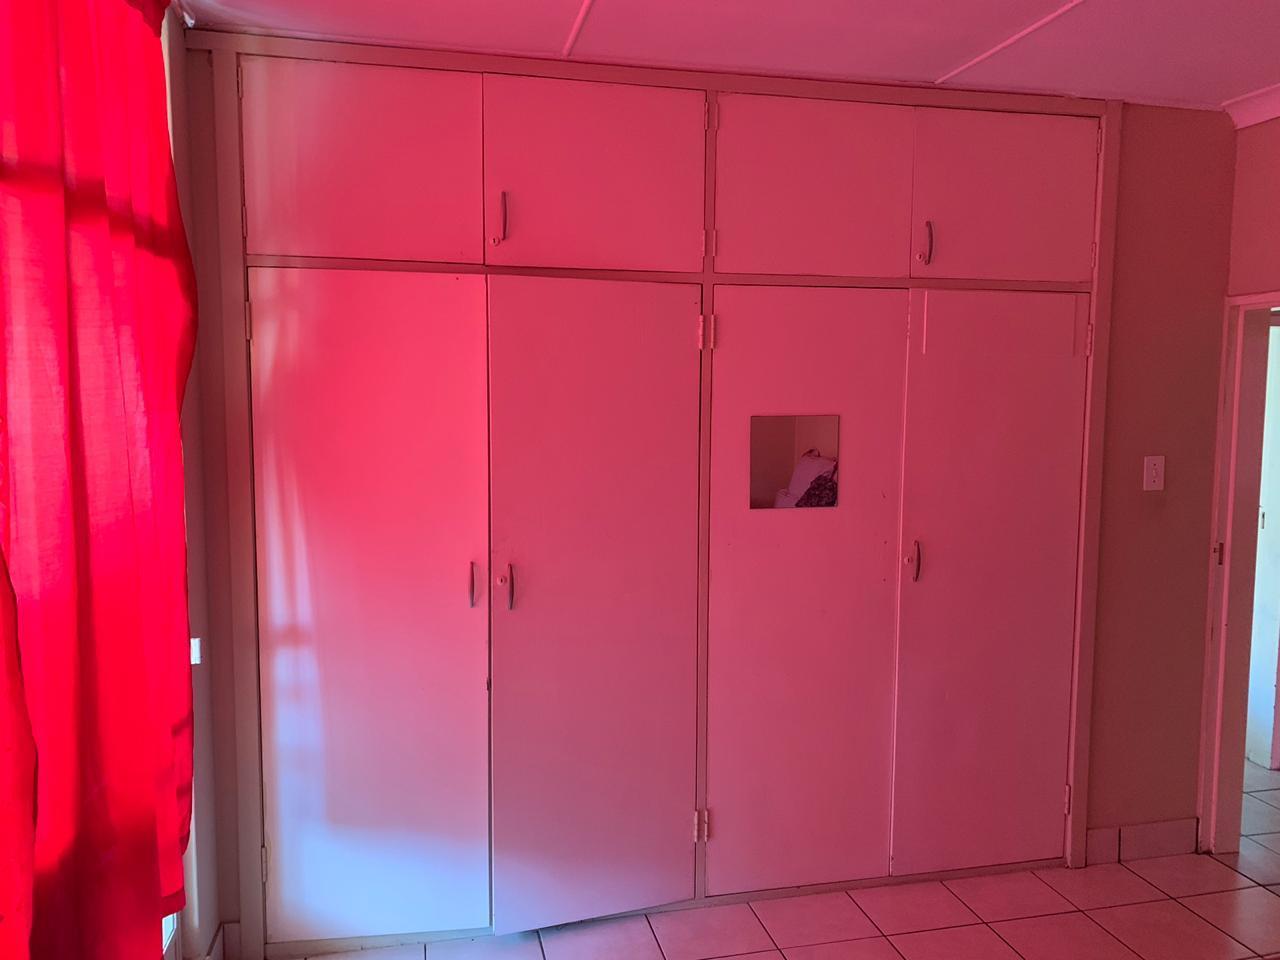 41 SUNHILL – 2½ BEDROOM APARTMENT IN WONDERBOOM SOUTH (RAPID RENTALS)